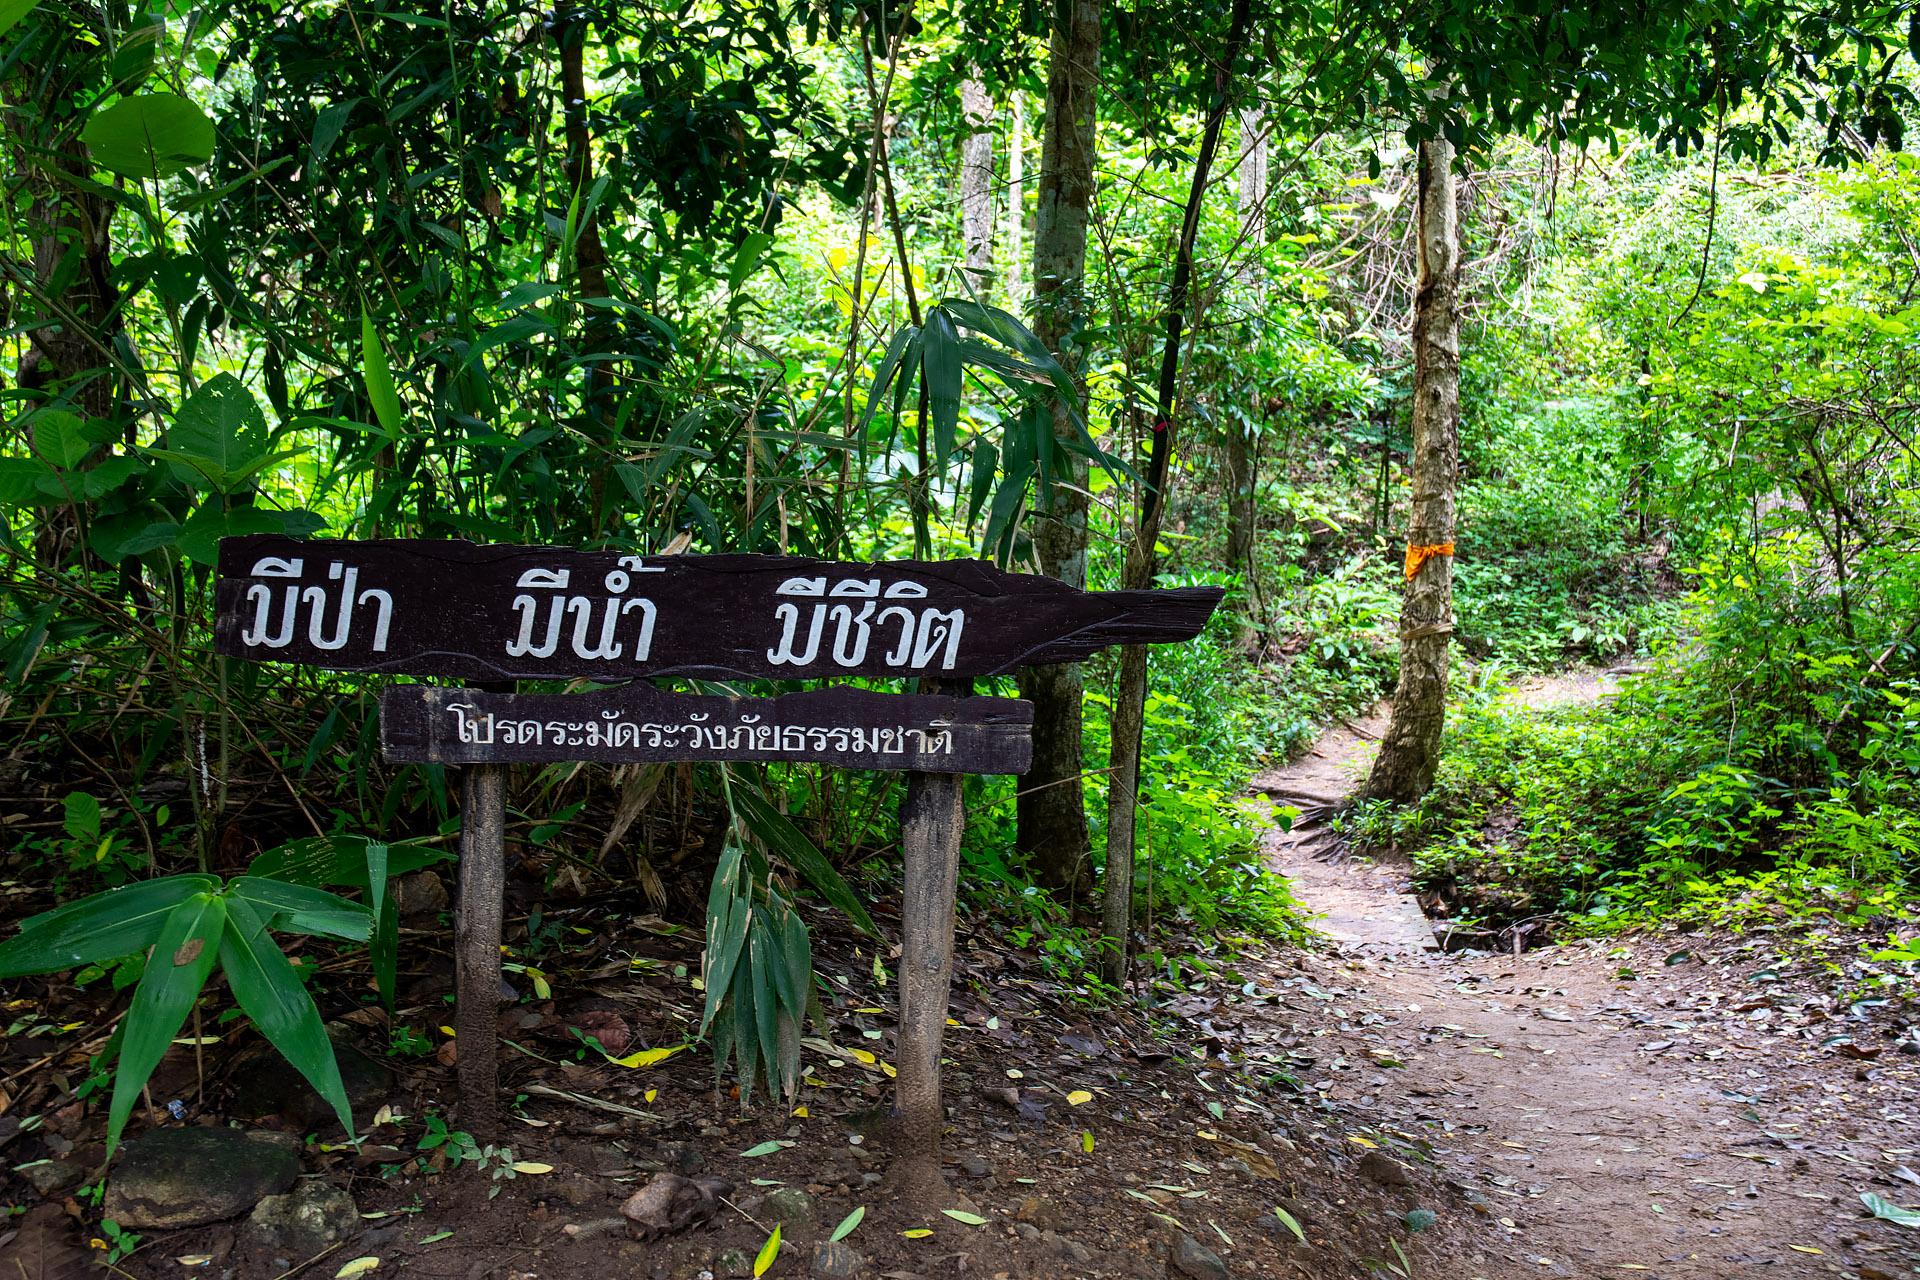 Monk's Trail [trailhead]